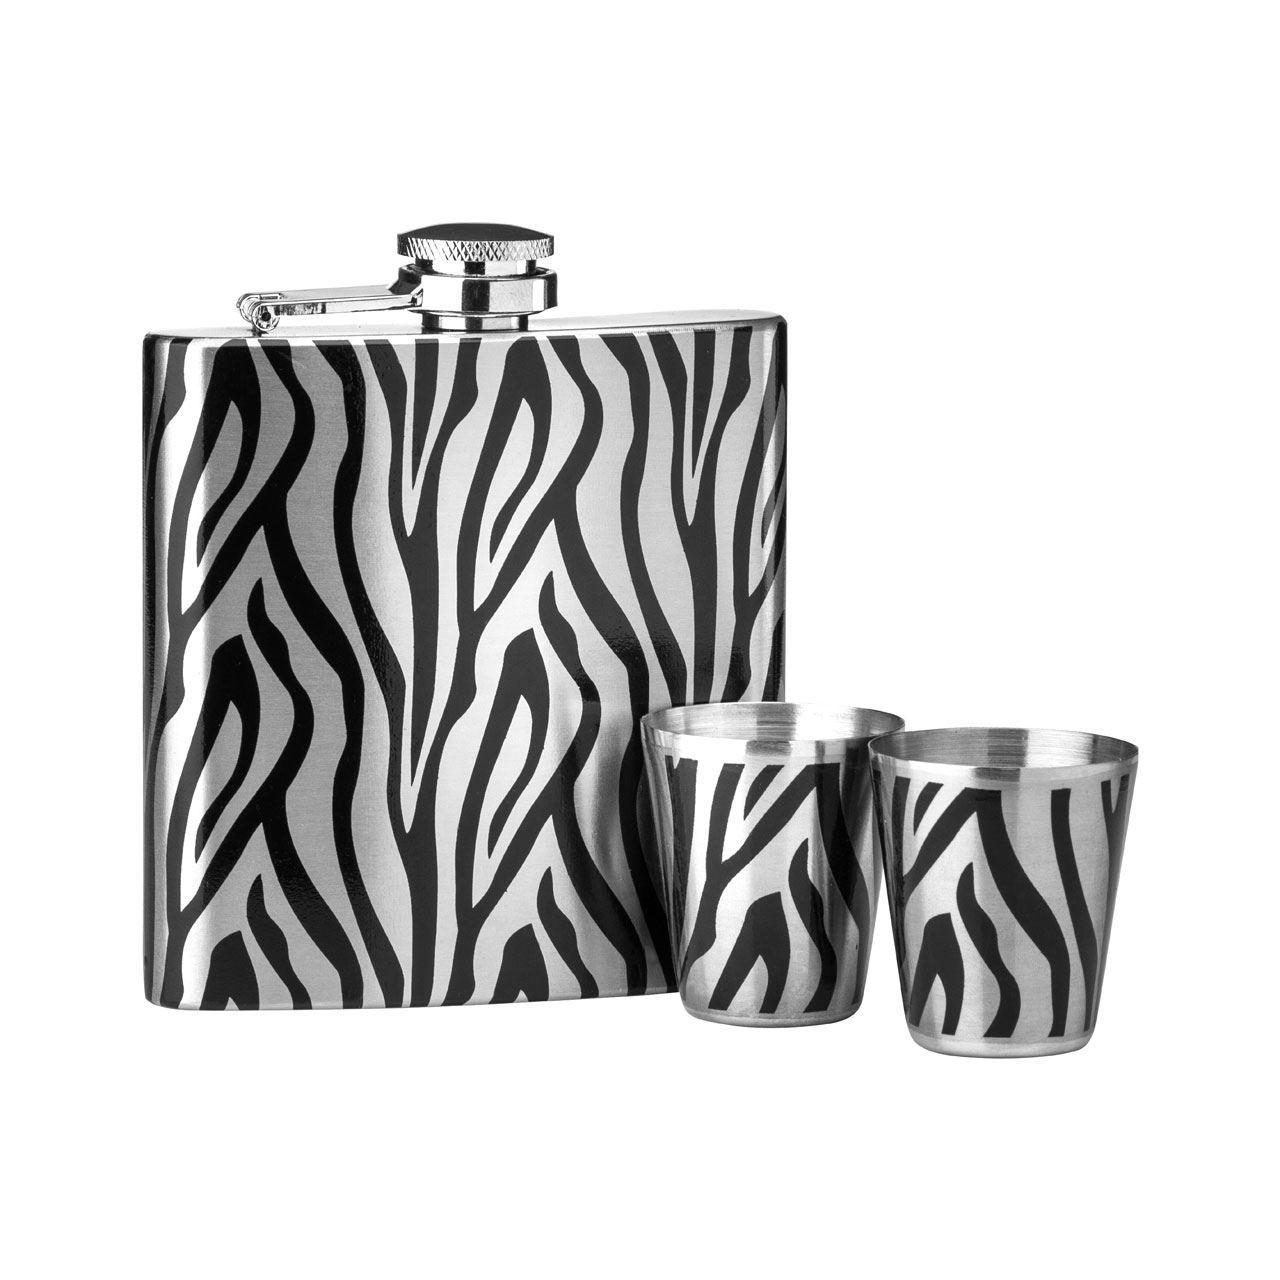 Hip Flask Set,Zebra Design/Stainless Steel,6Oz Flask/2 Cups